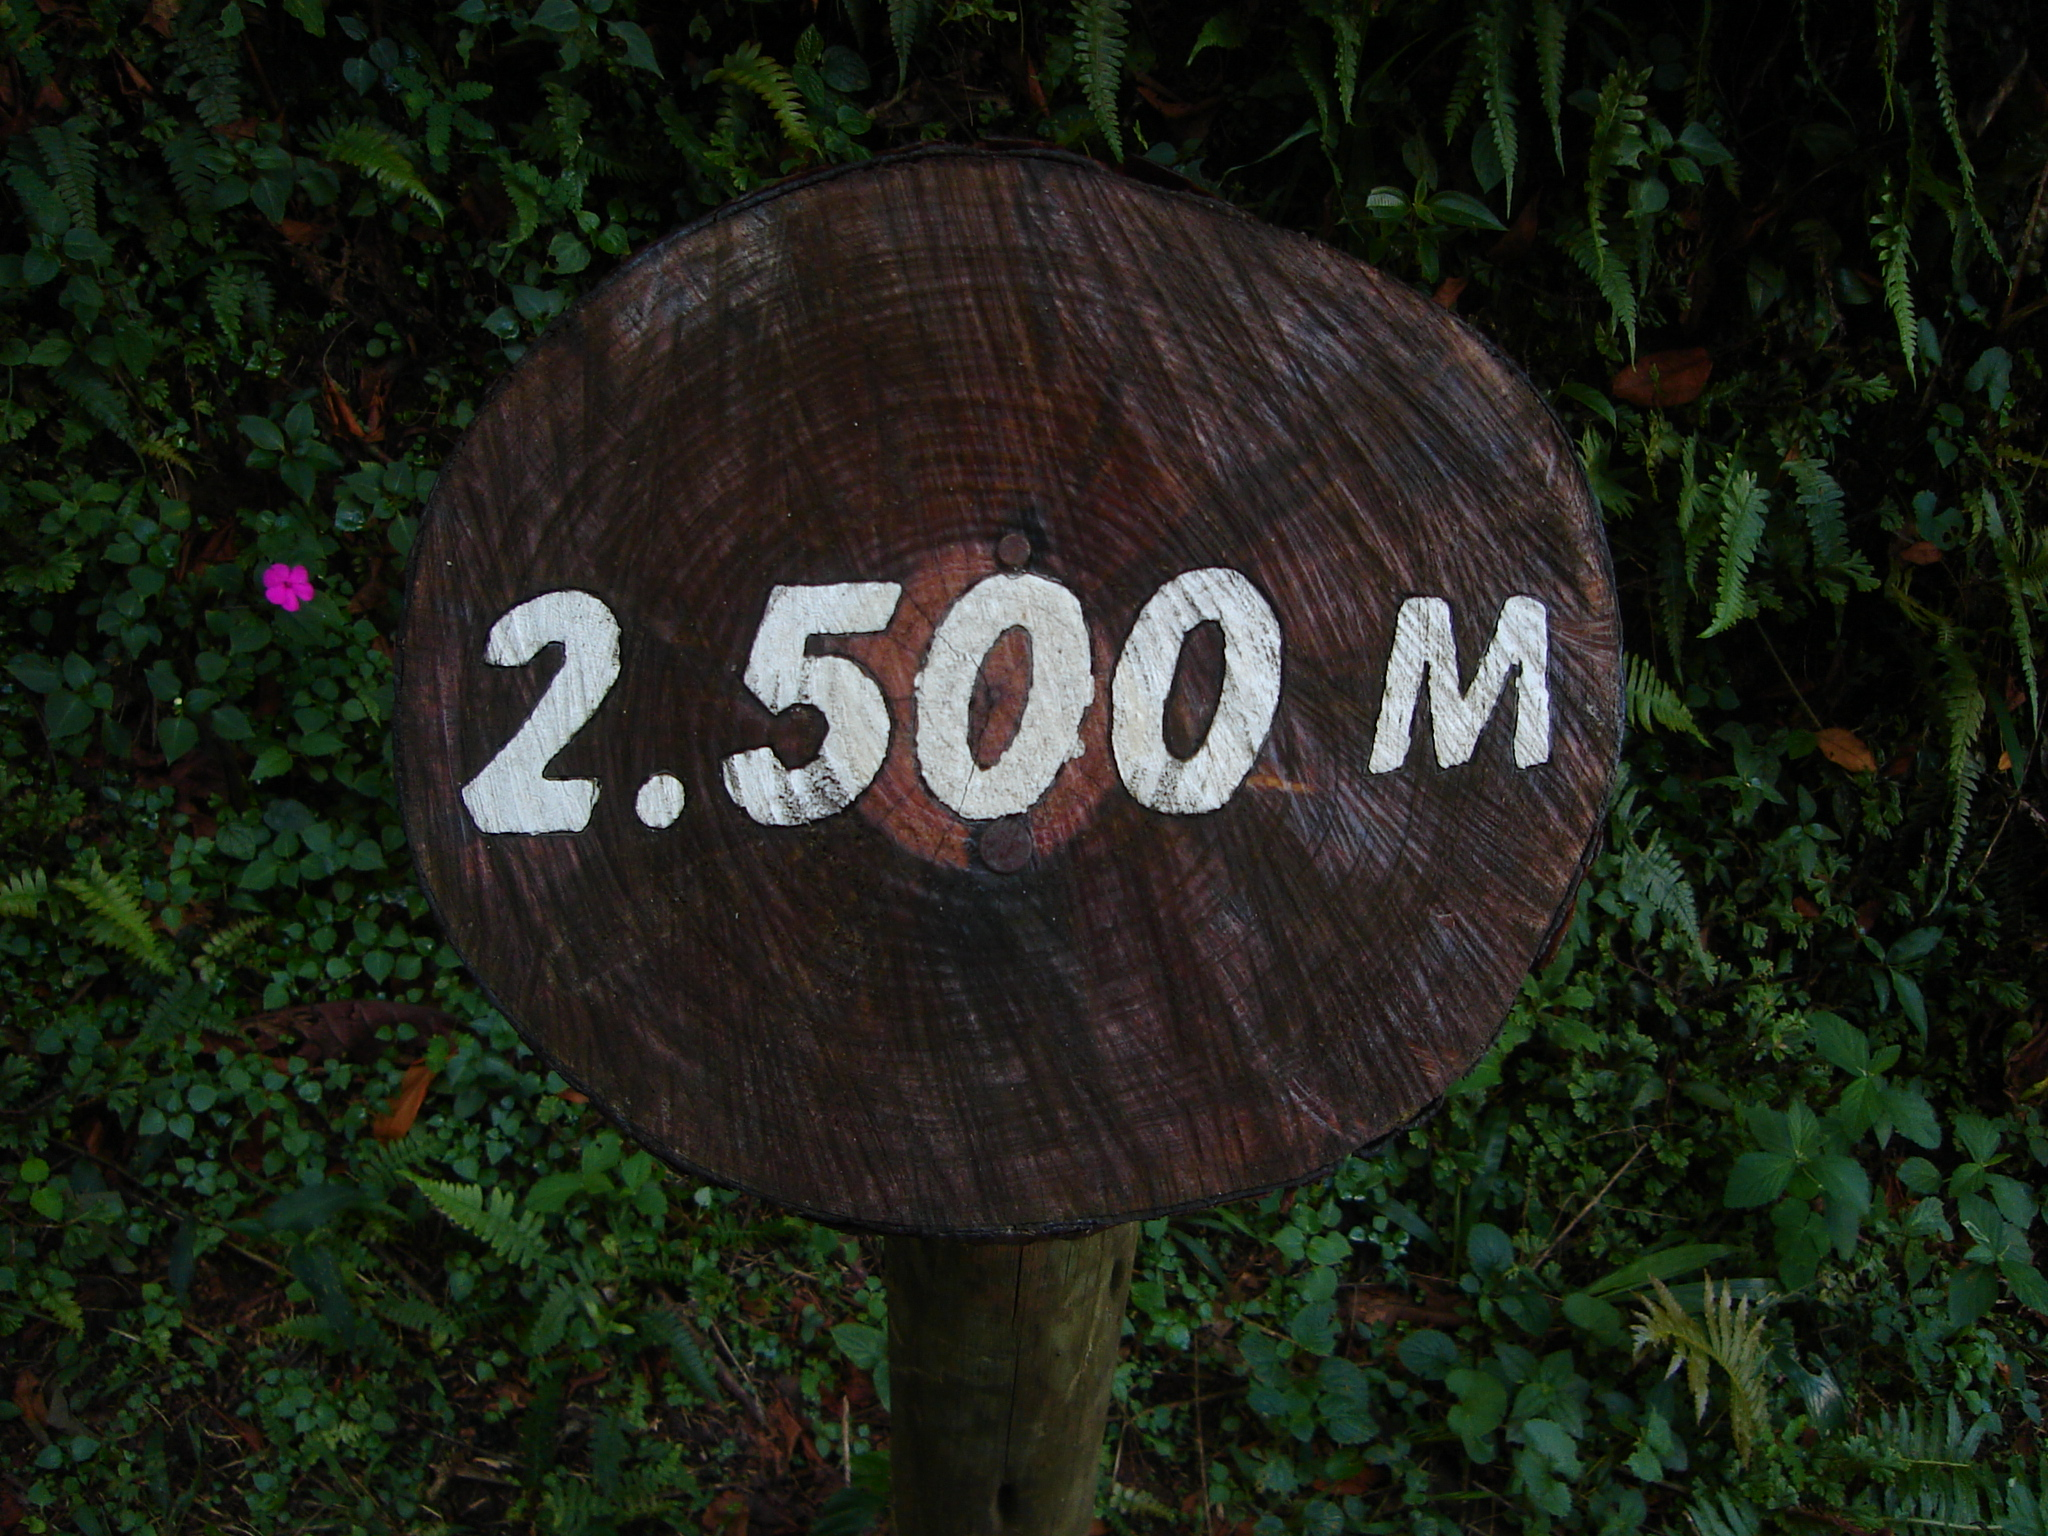 poows sign 2.500 m meters meter white on black letters tree stump